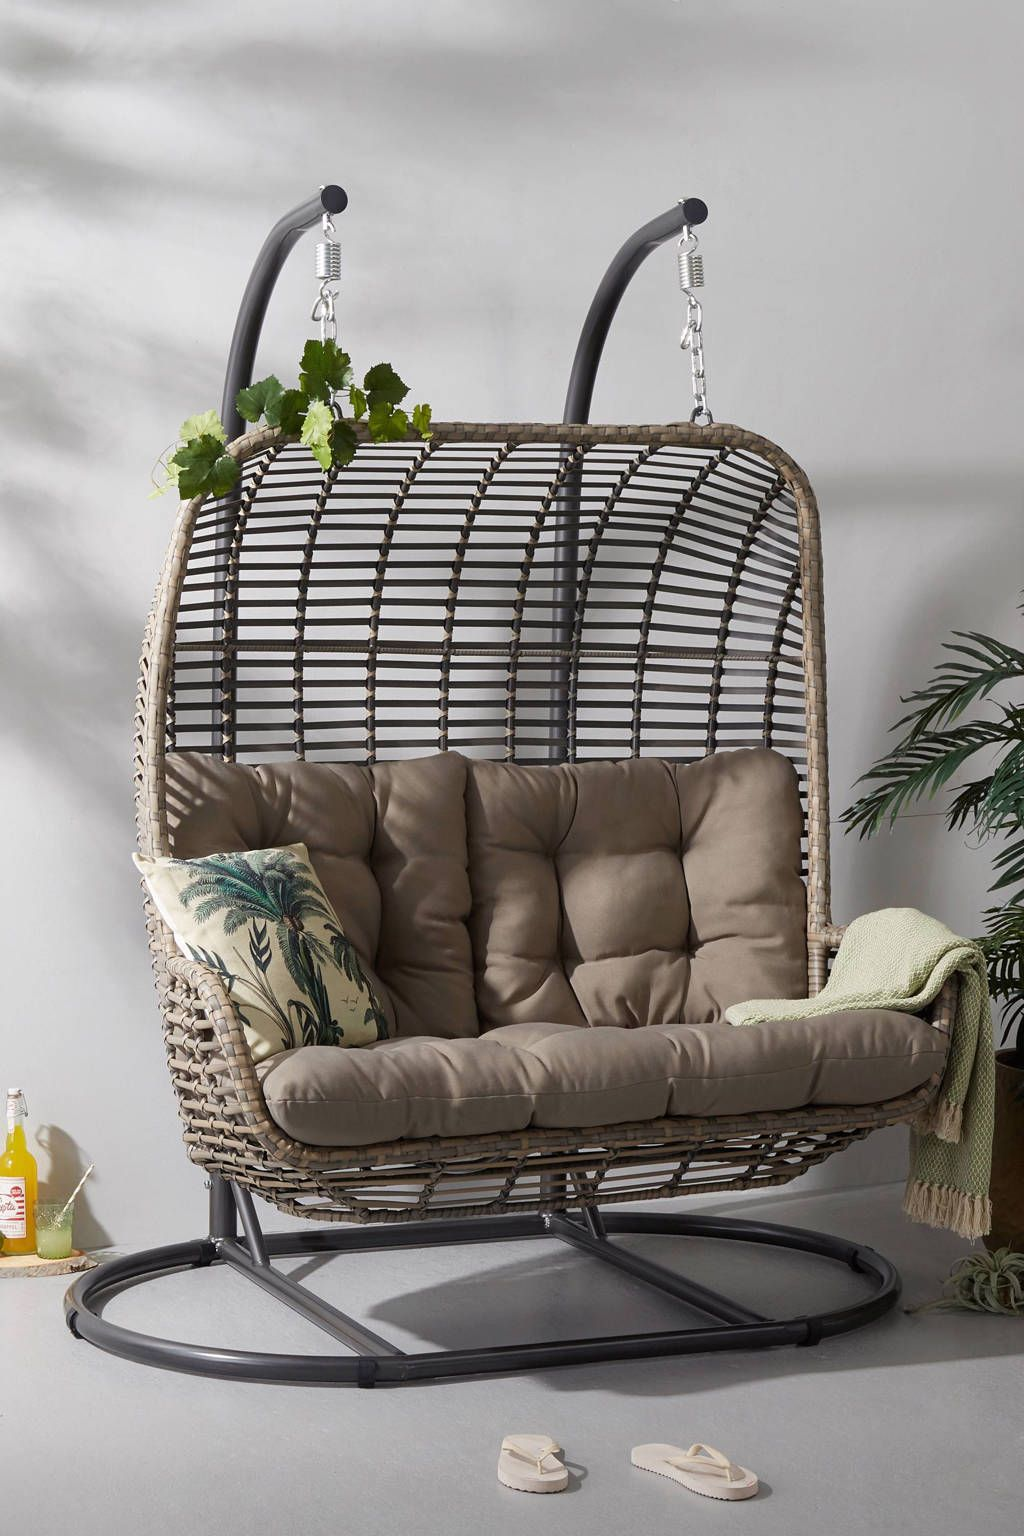 Rotan Hangstoel Wehkamp.Pin By Meri S On Hanging Chairs In 2020 Hanging Chair Chair